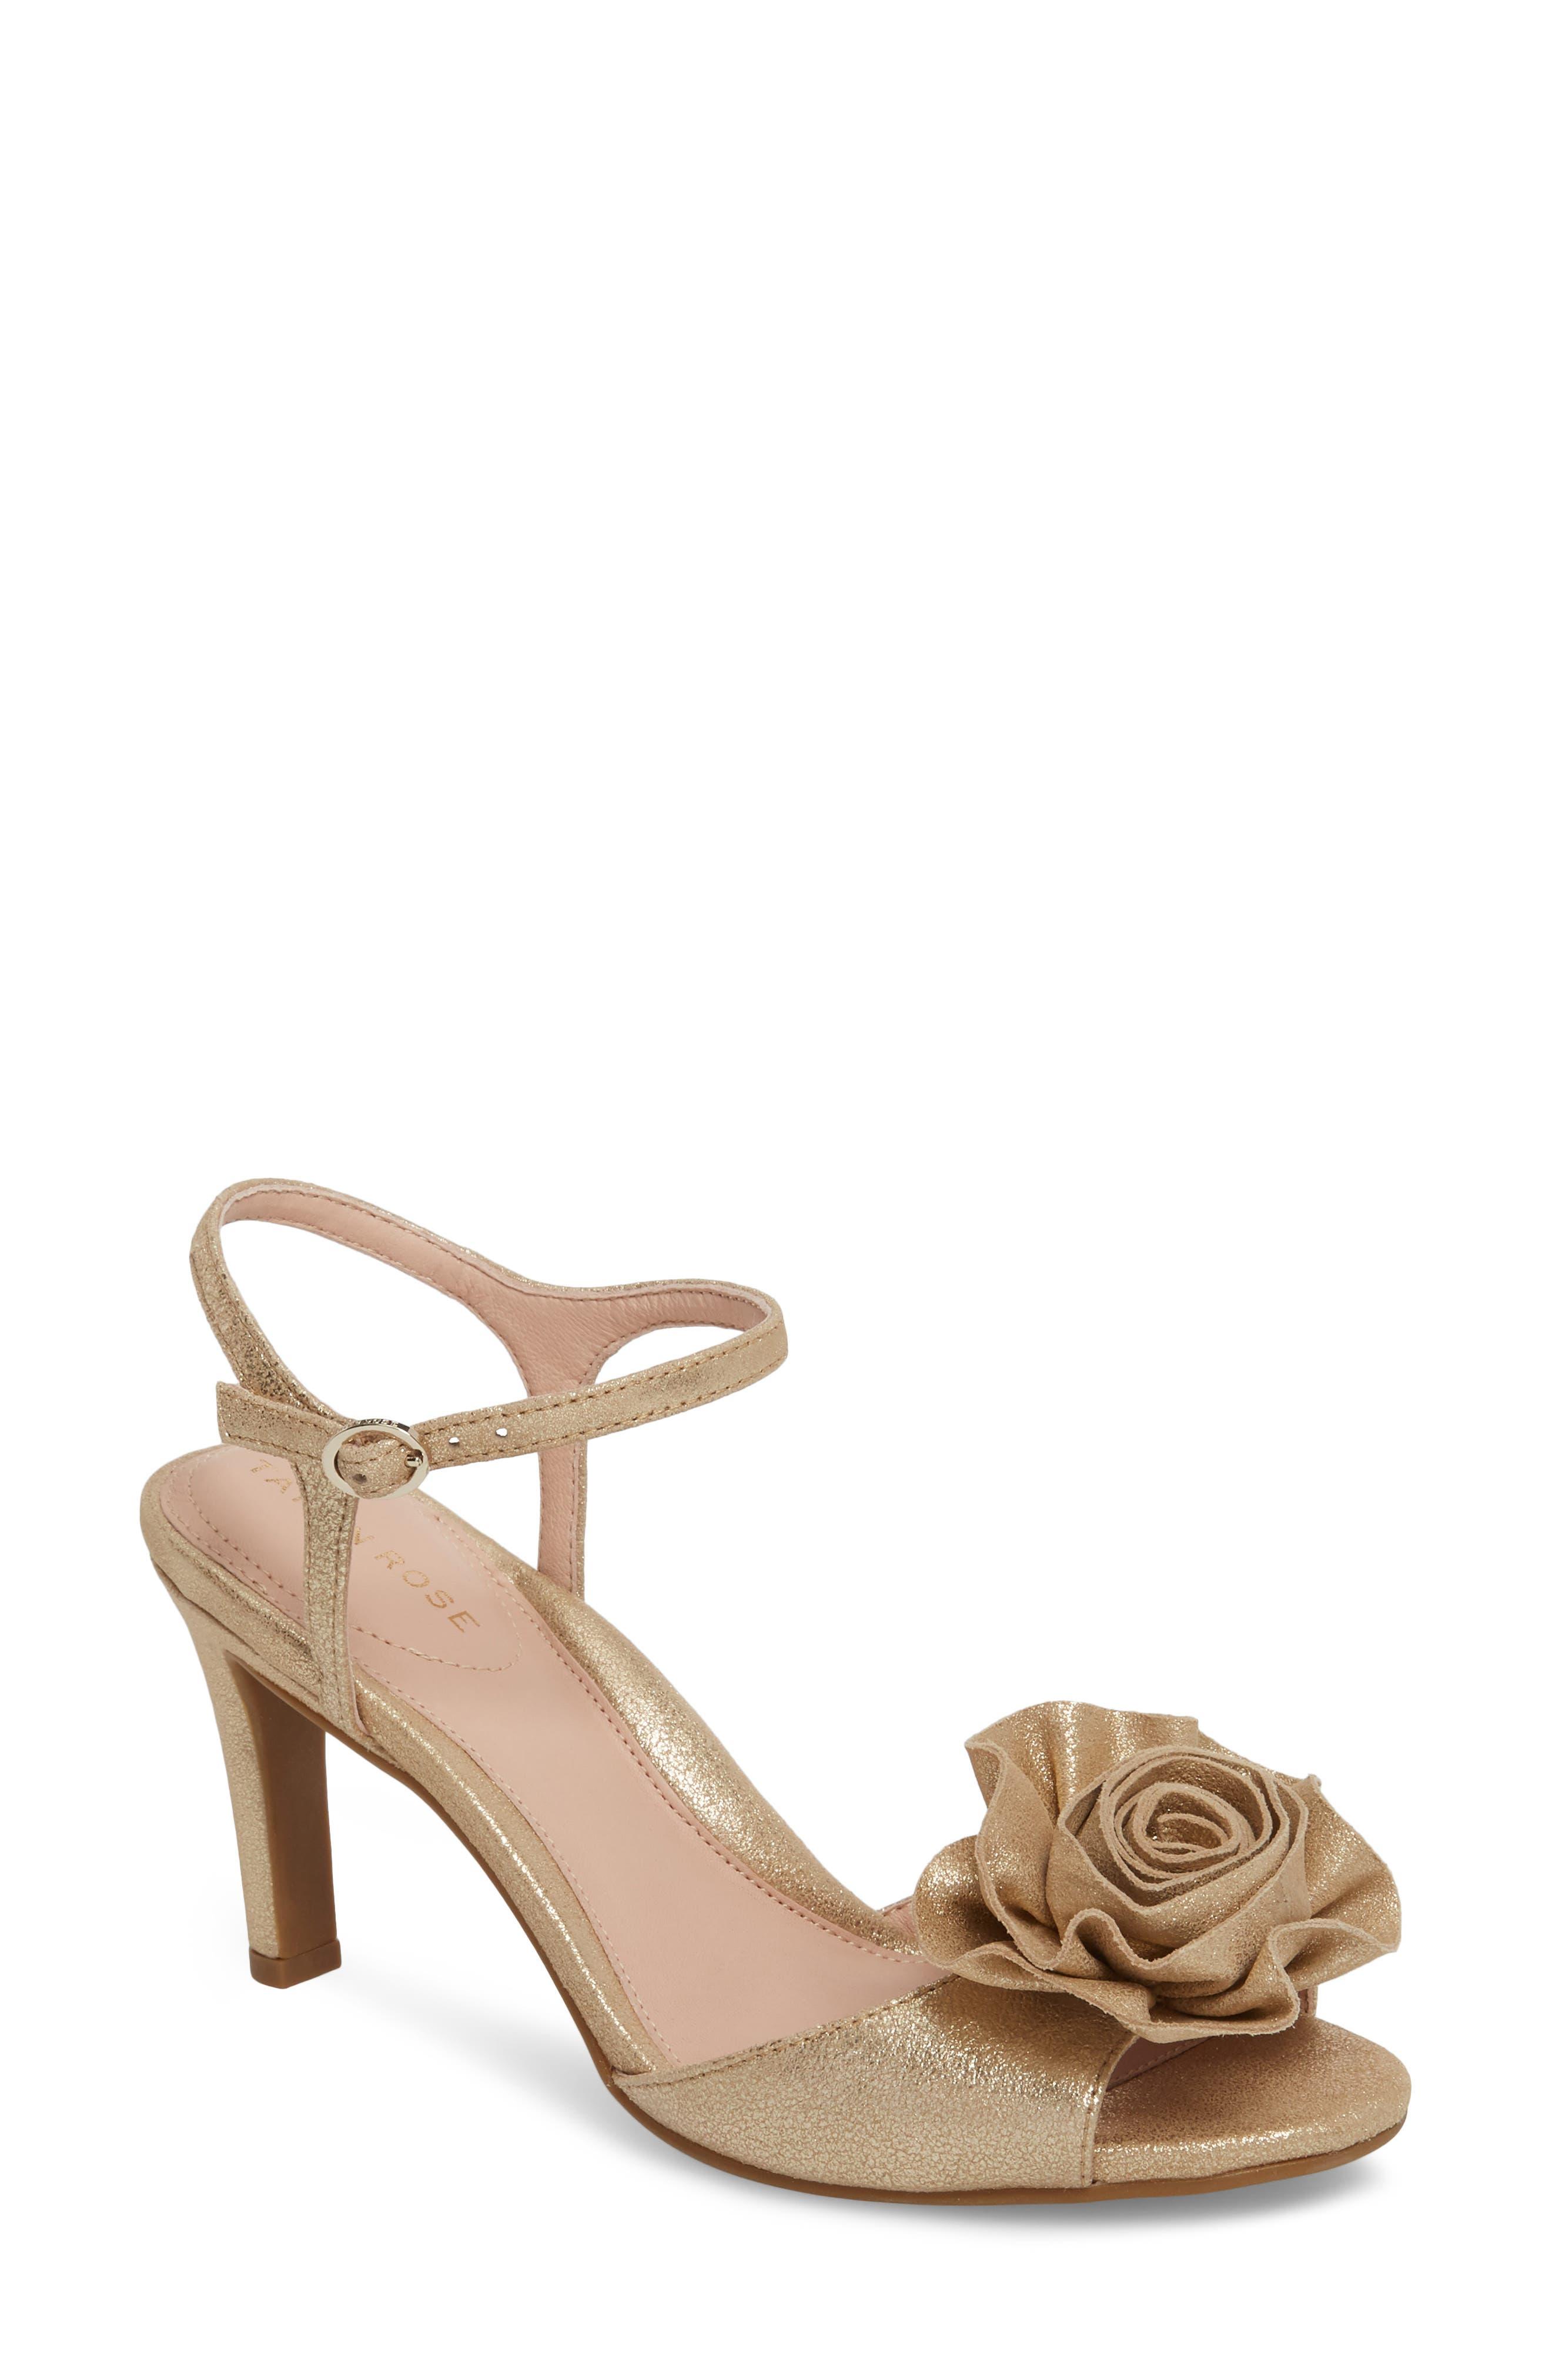 Jacklyn Flower Sandal,                         Main,                         color, Gold Shimmer Fabric